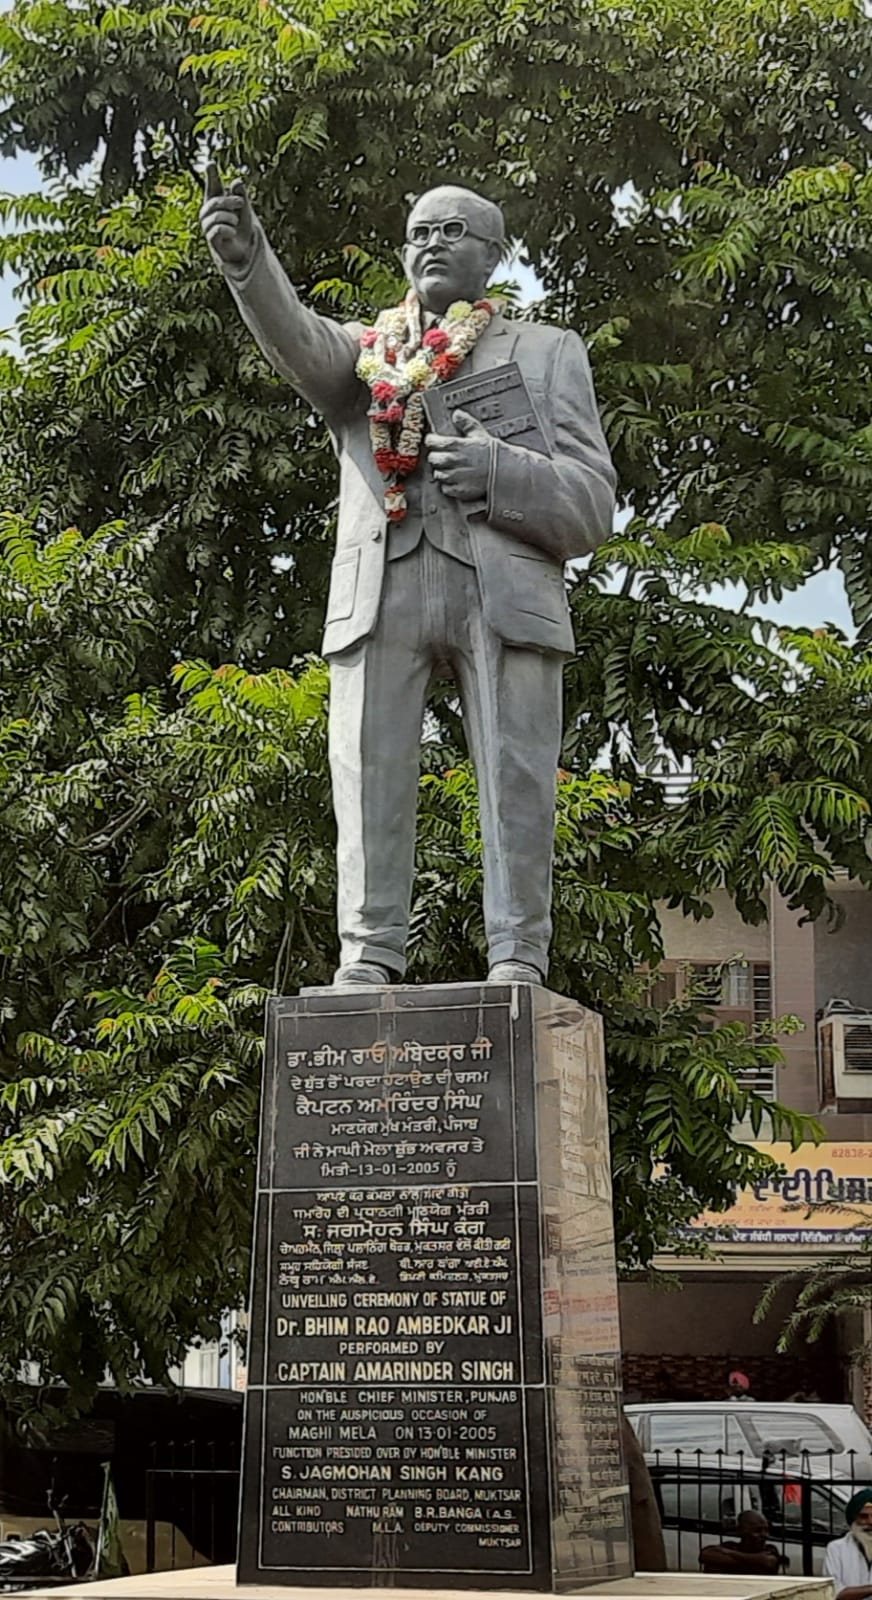 मुख्य मंत्री जी करो ख्याल, अंबेडकर पार्क है बदहाल : ढोसीवाल